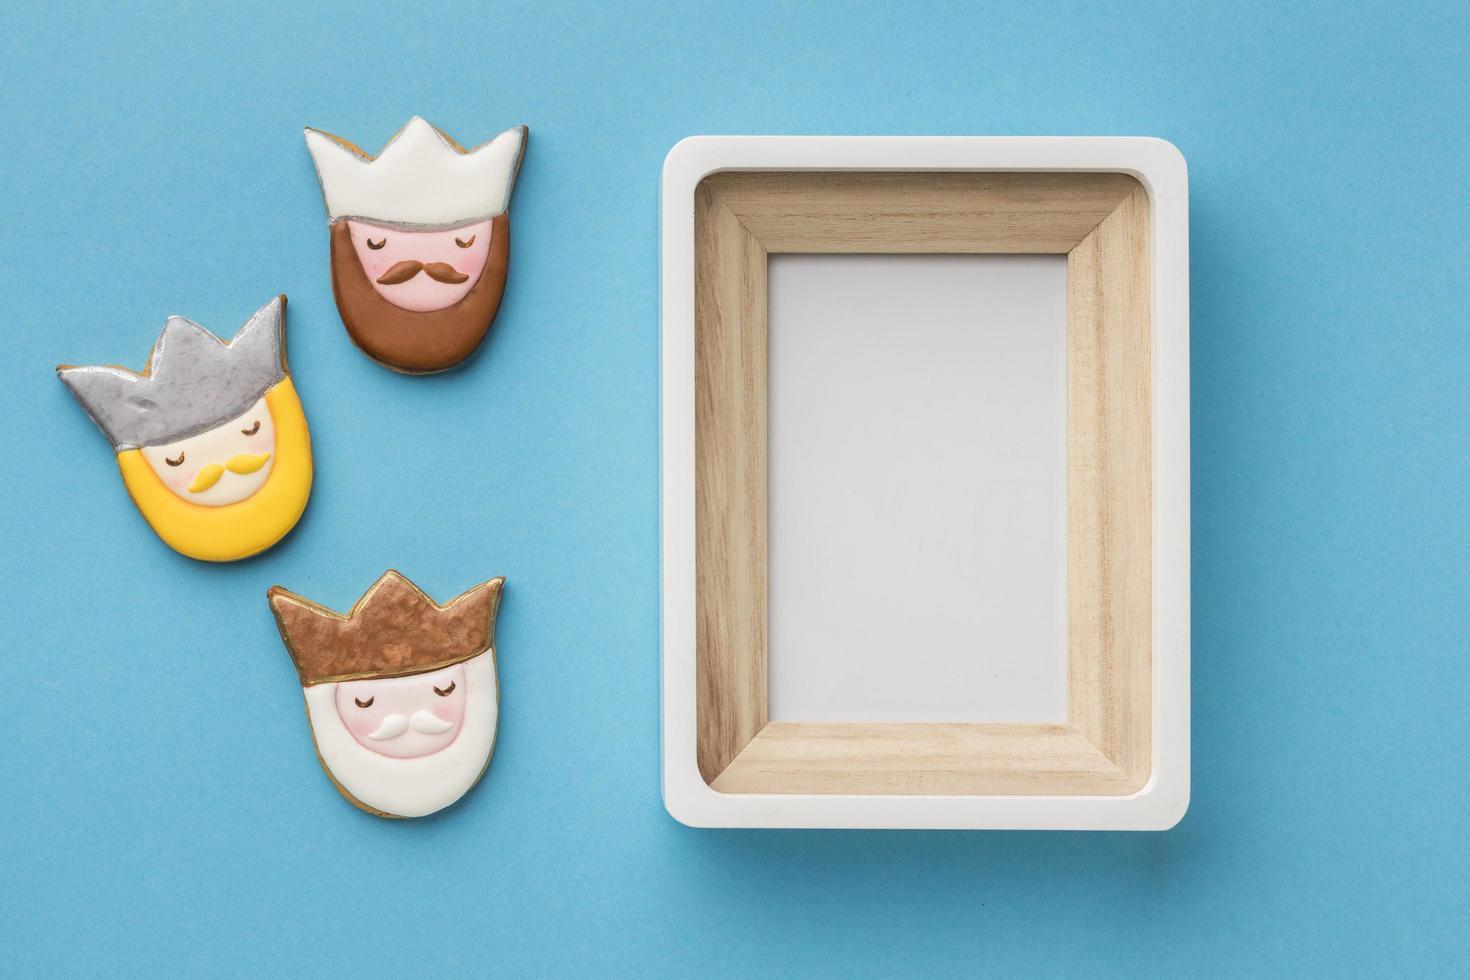 trois biscuits rois et cadre photo vierge